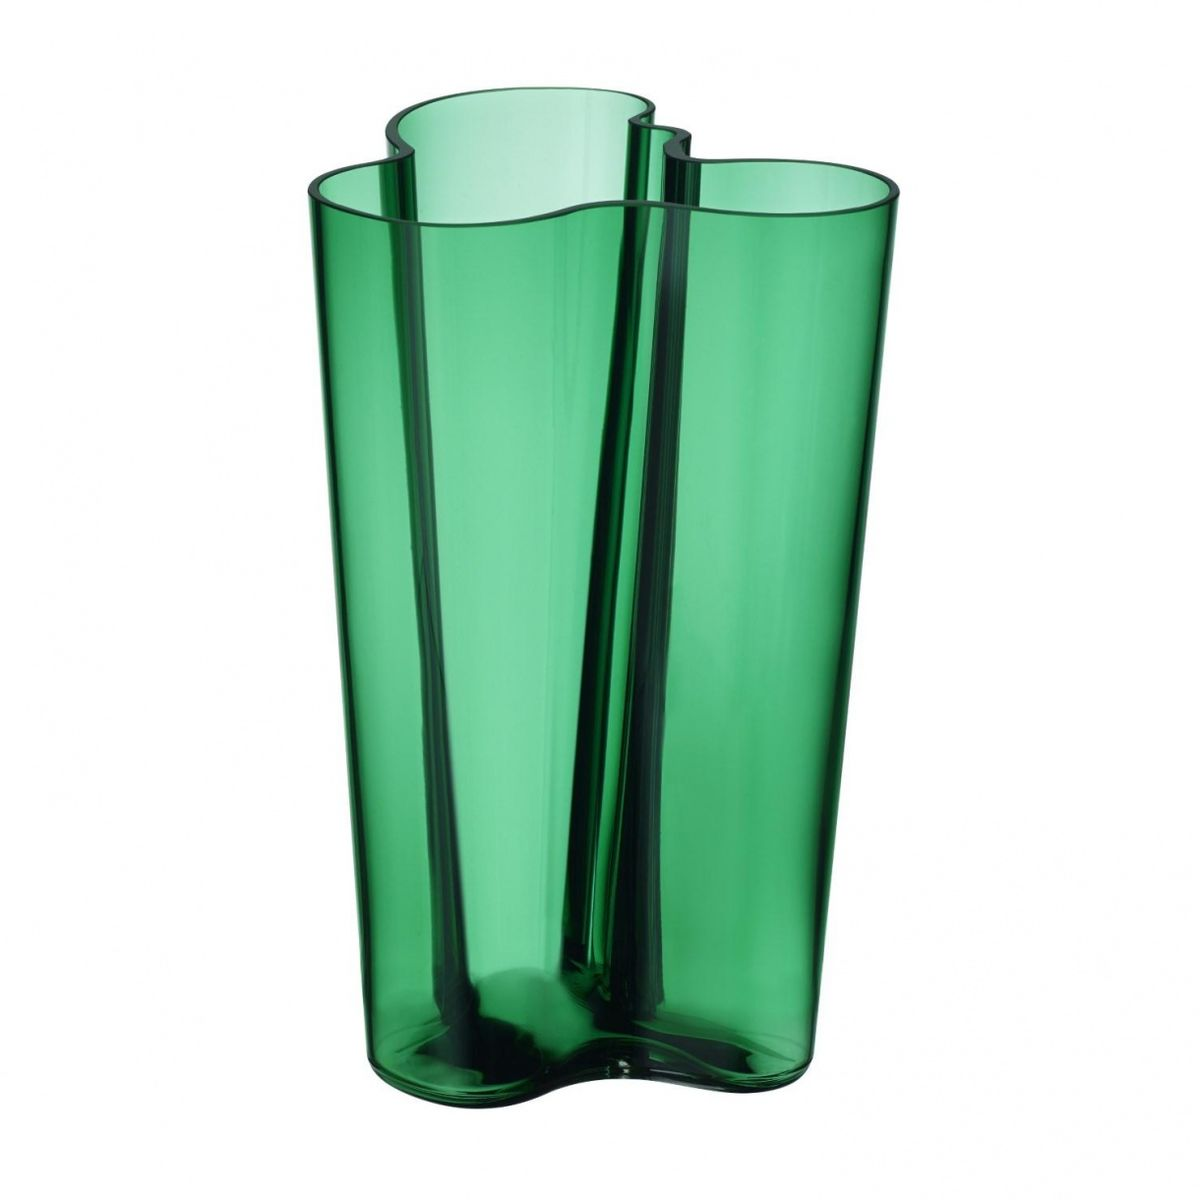 Alvar Aalto Vase 251mm